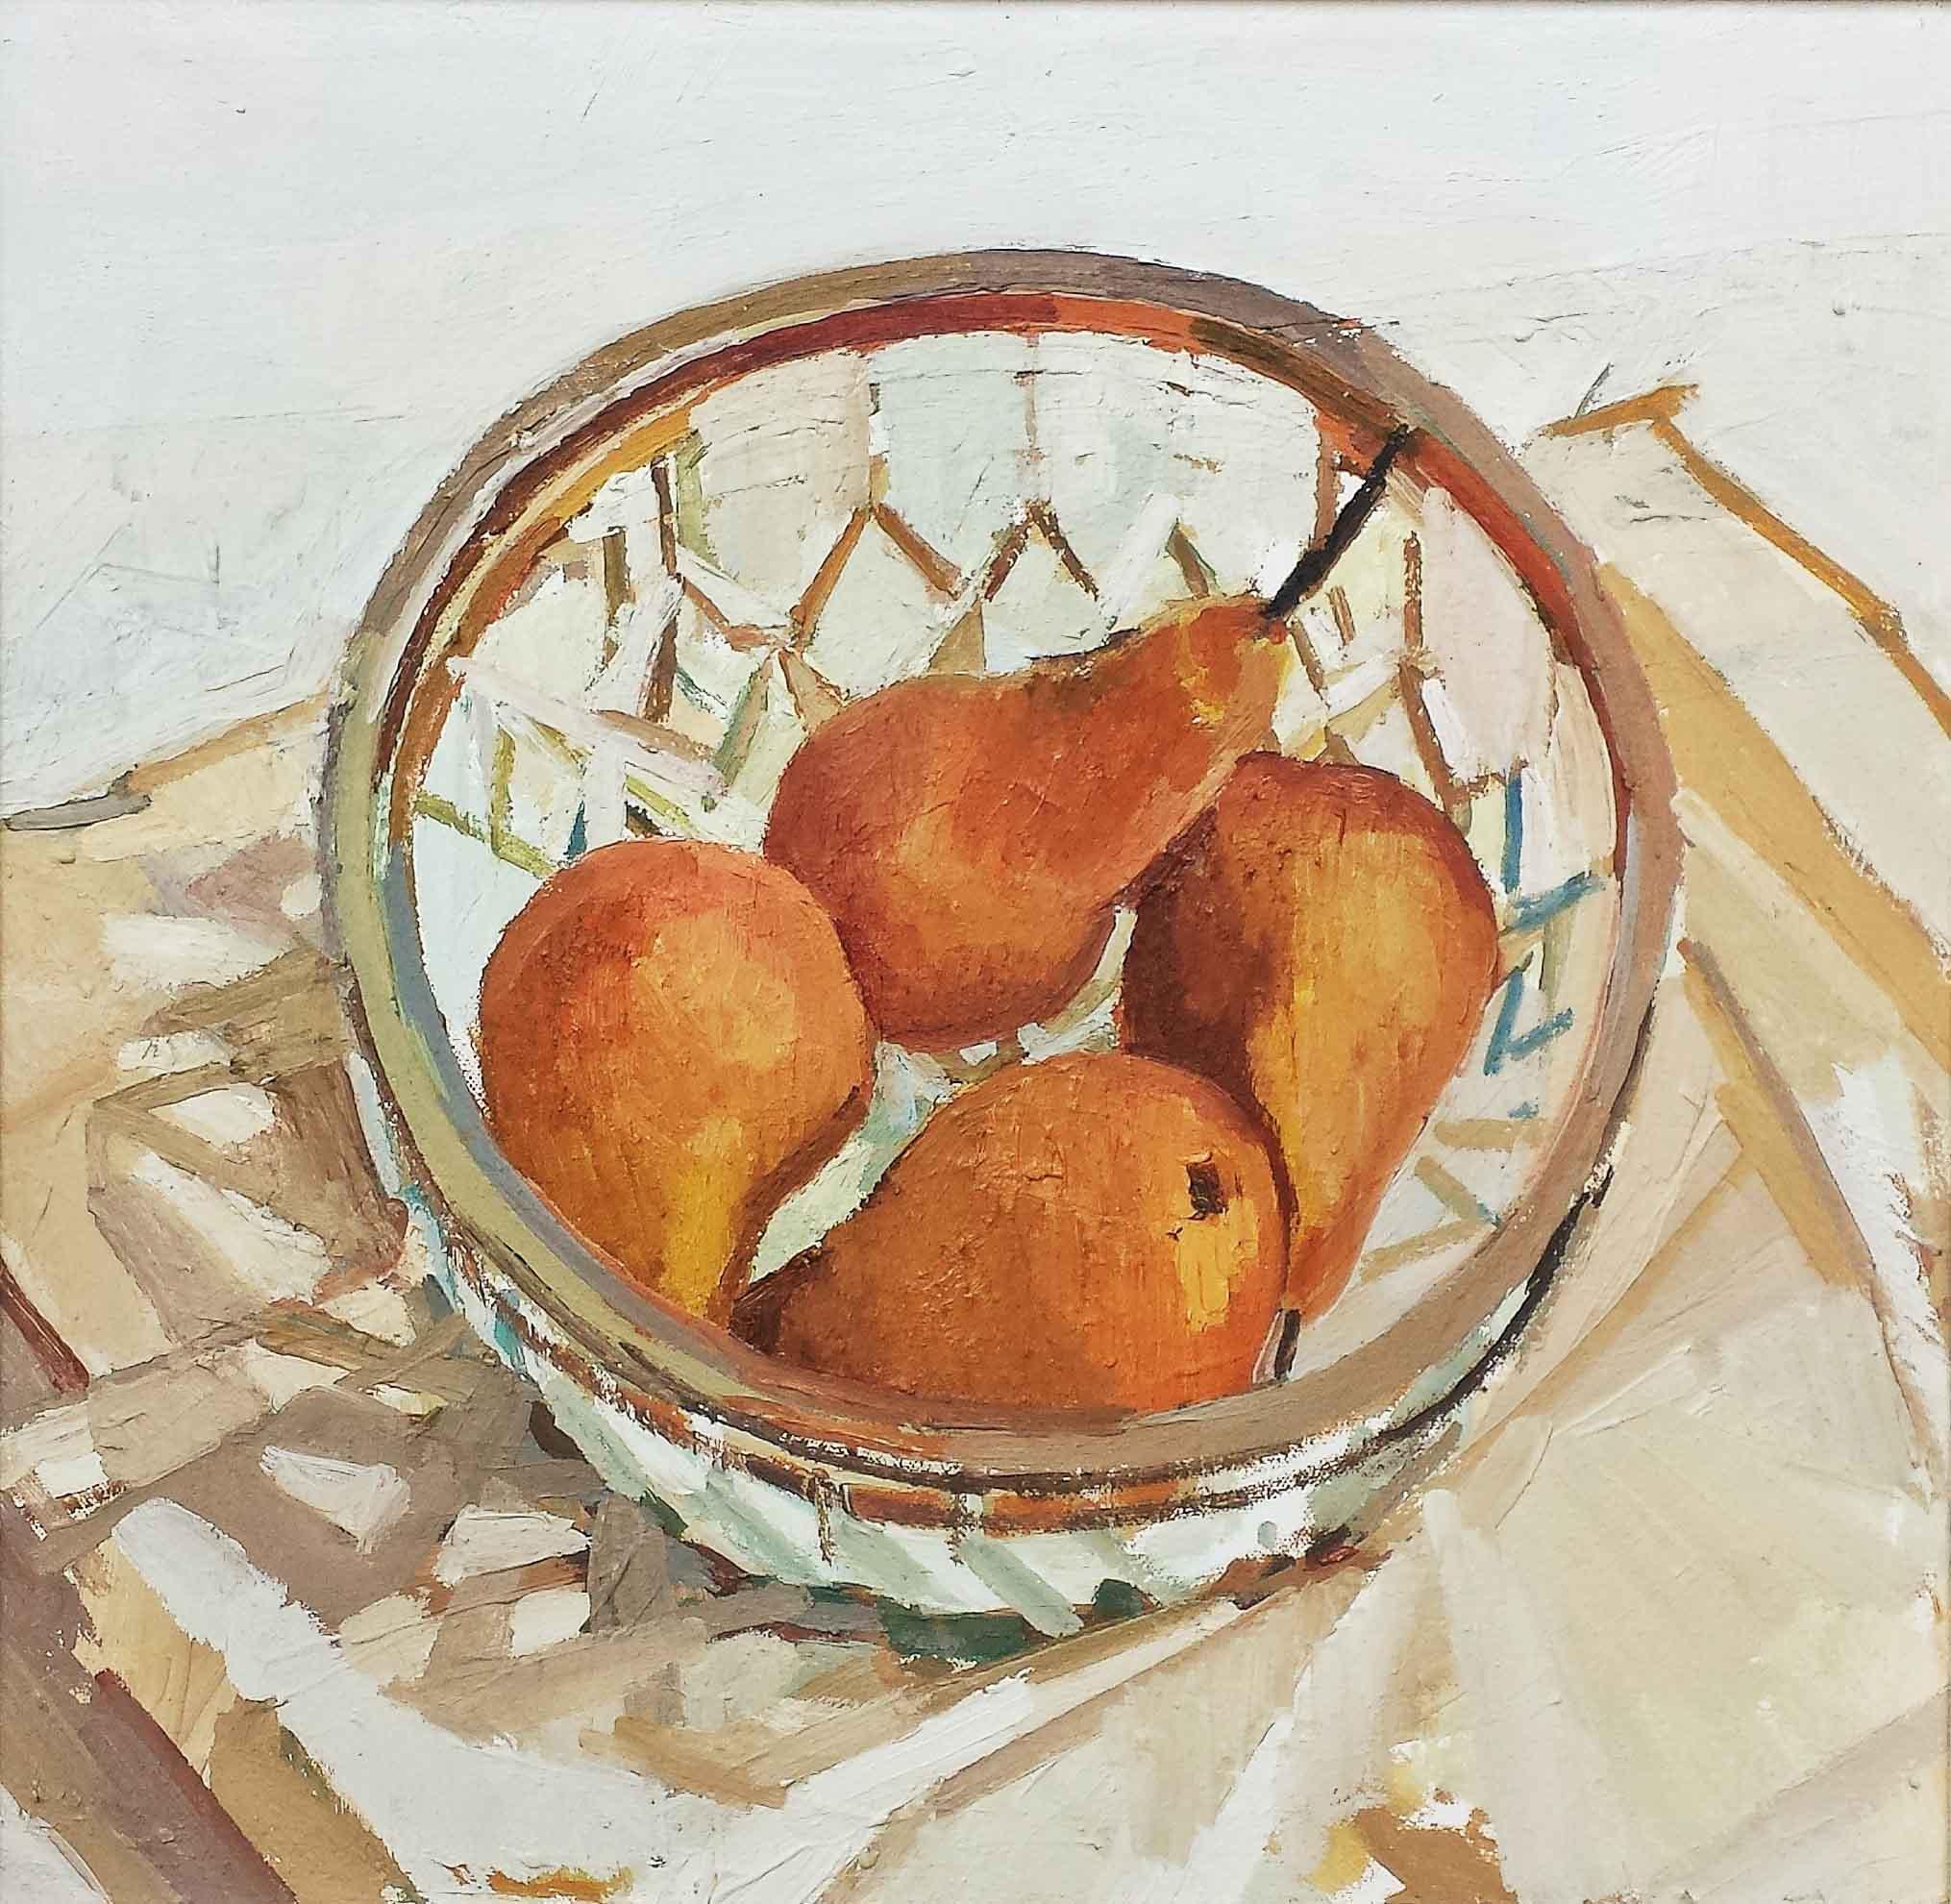 42 x 40 cm Hot Tub, Oil on Canvas